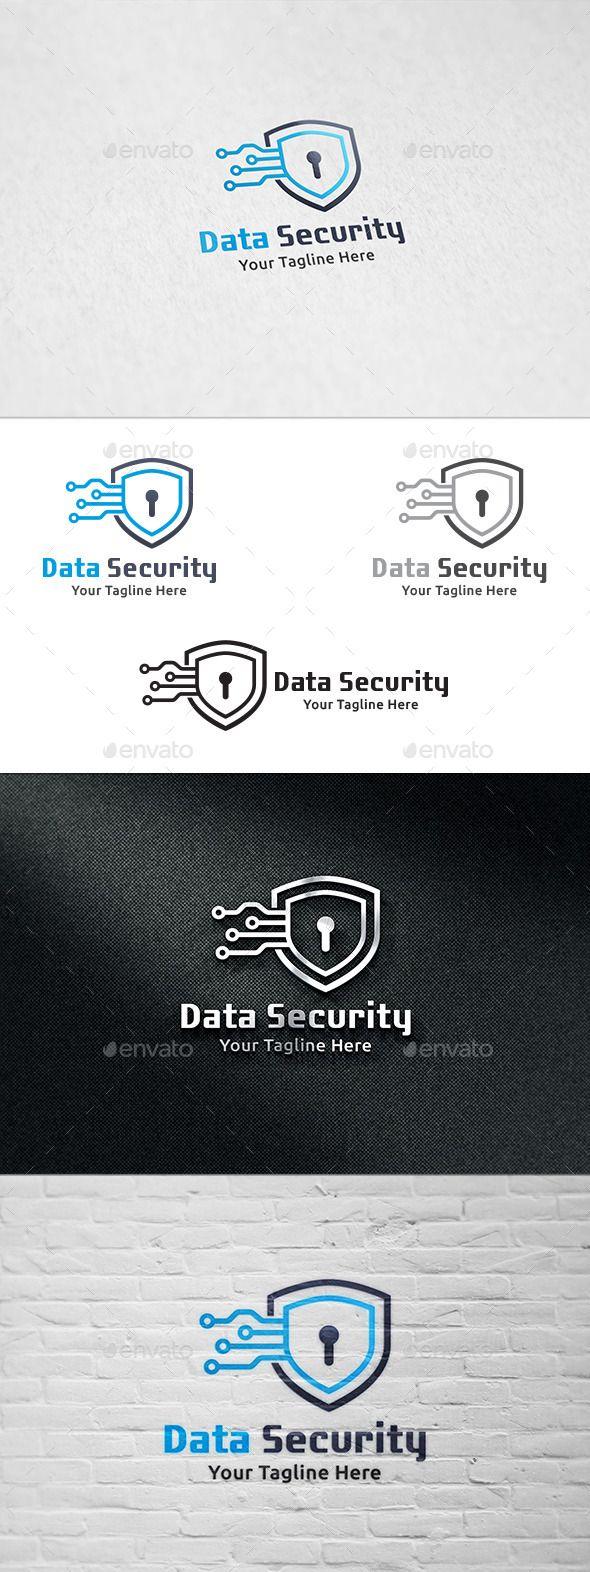 Data Security Logo Template 보안 로고, 로고, 명함